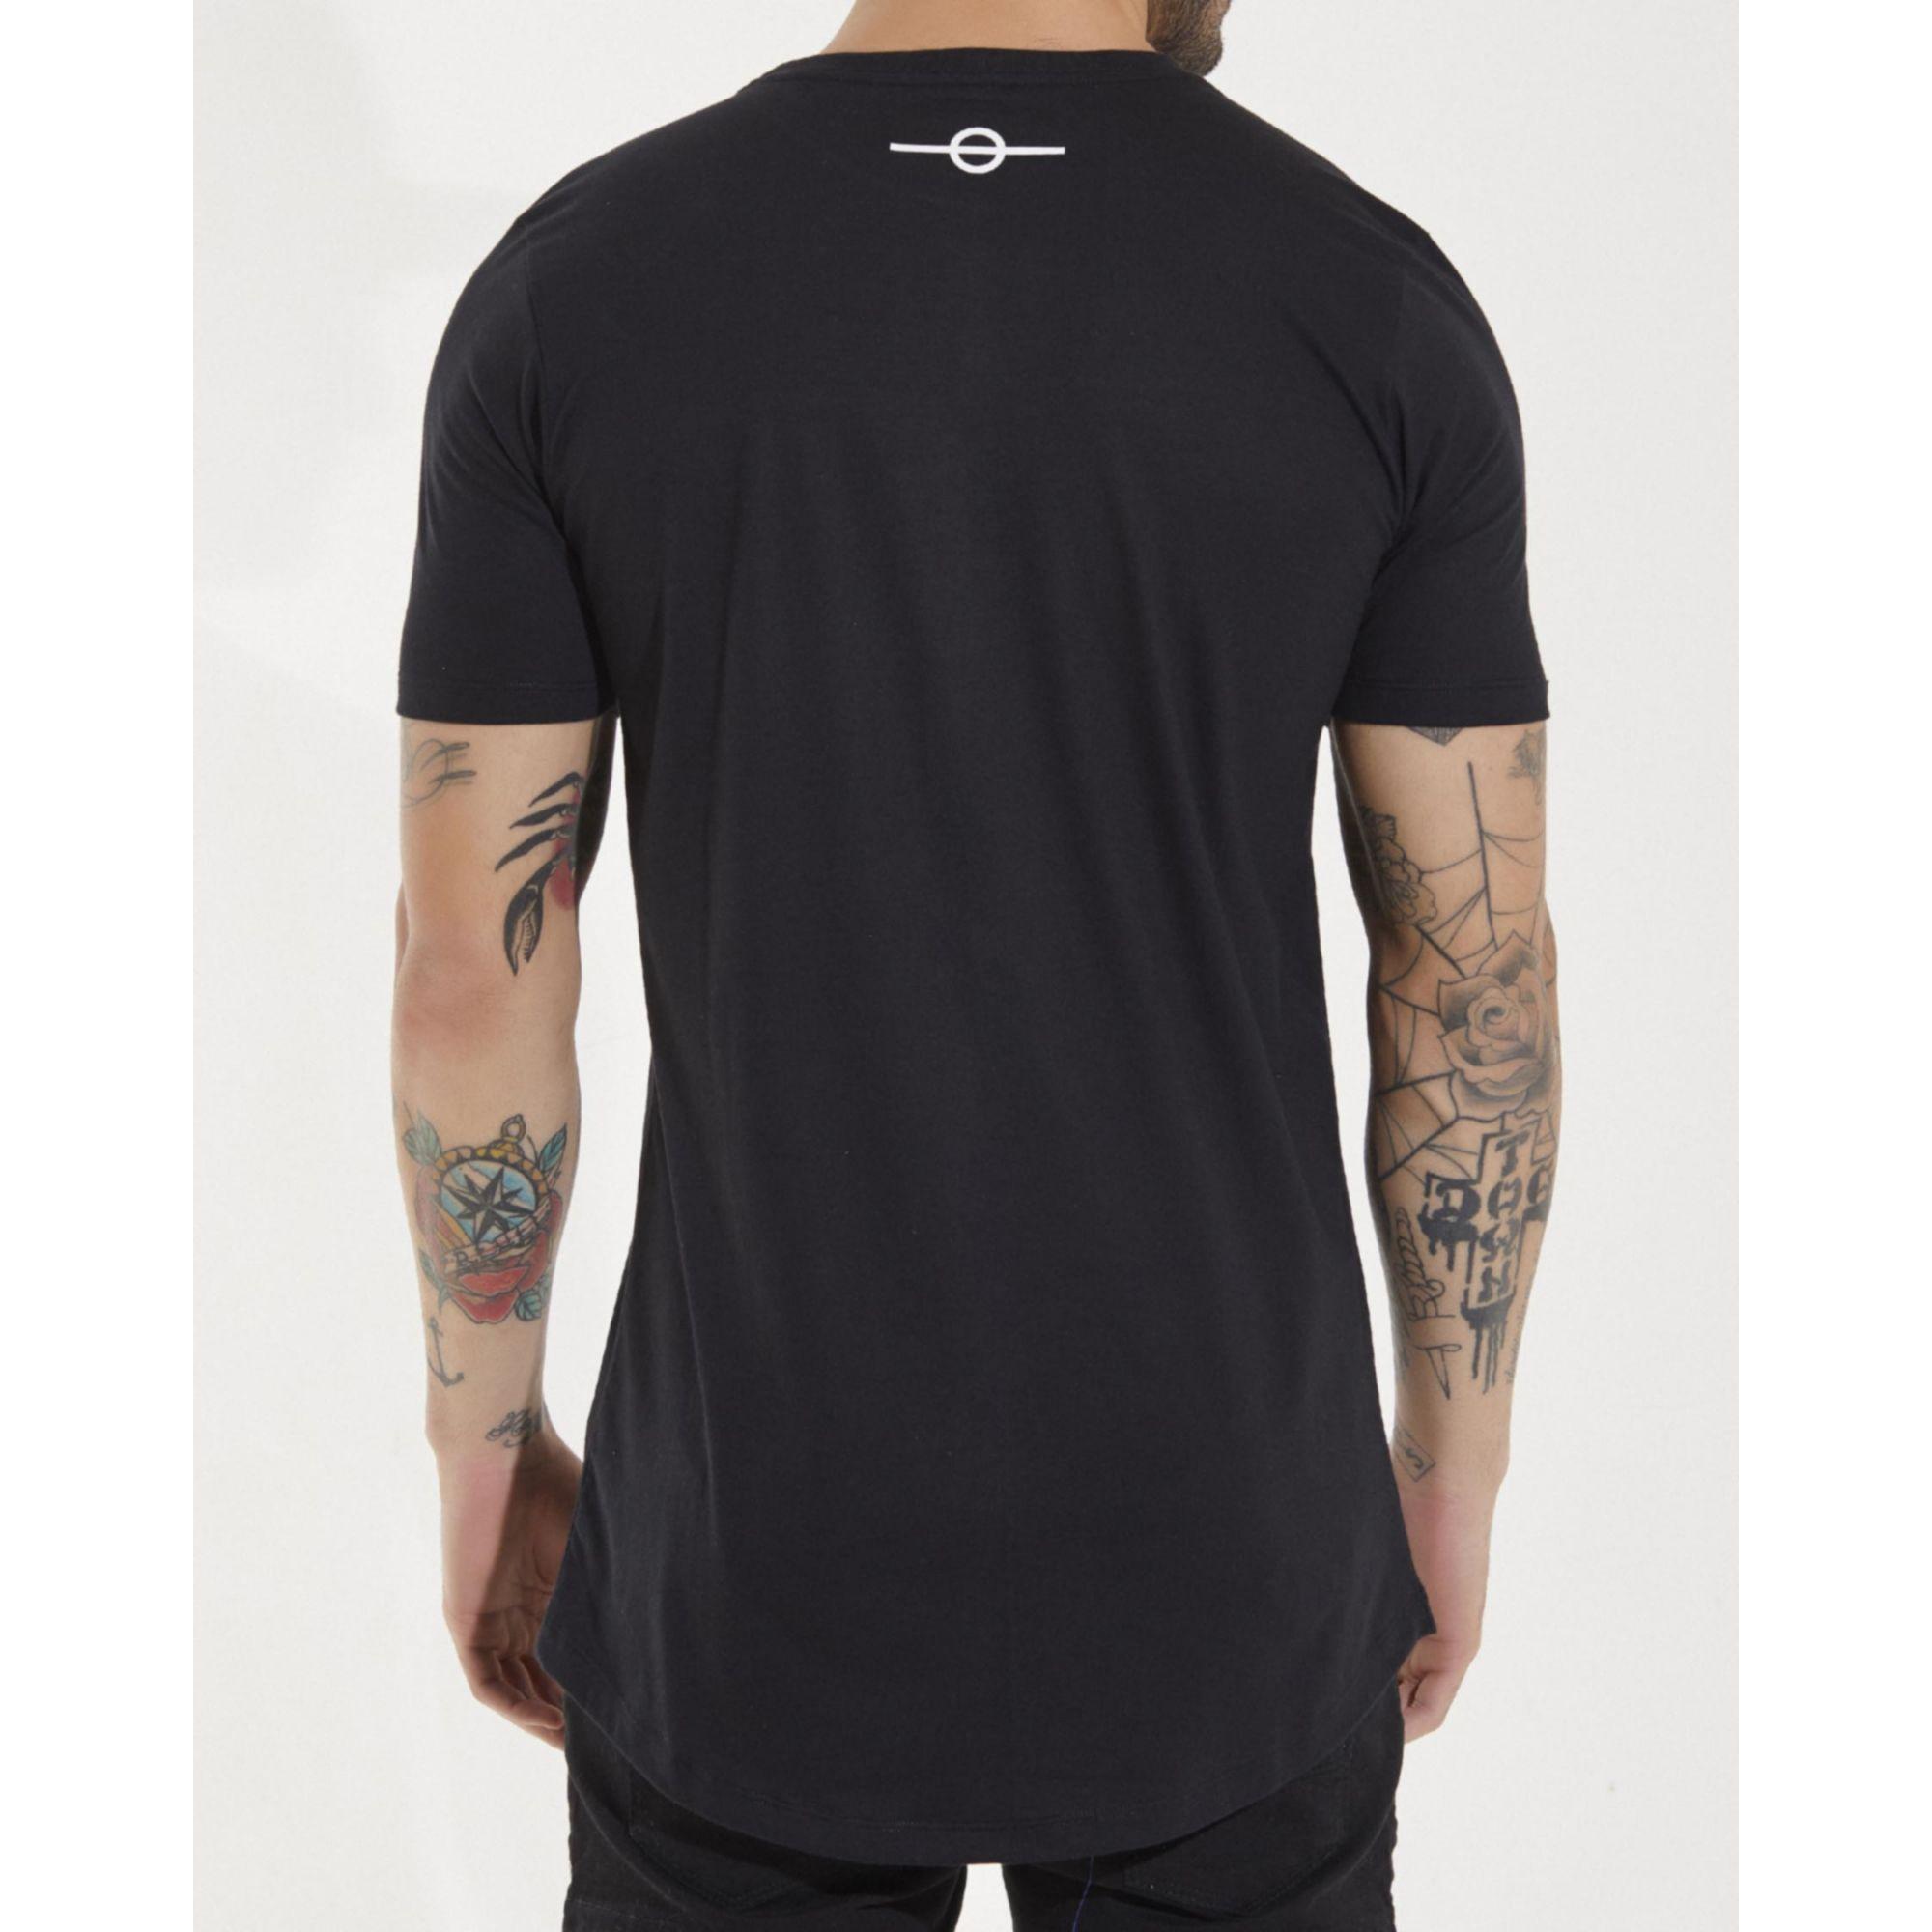 Camiseta Buh Zíper Gorgurão Black